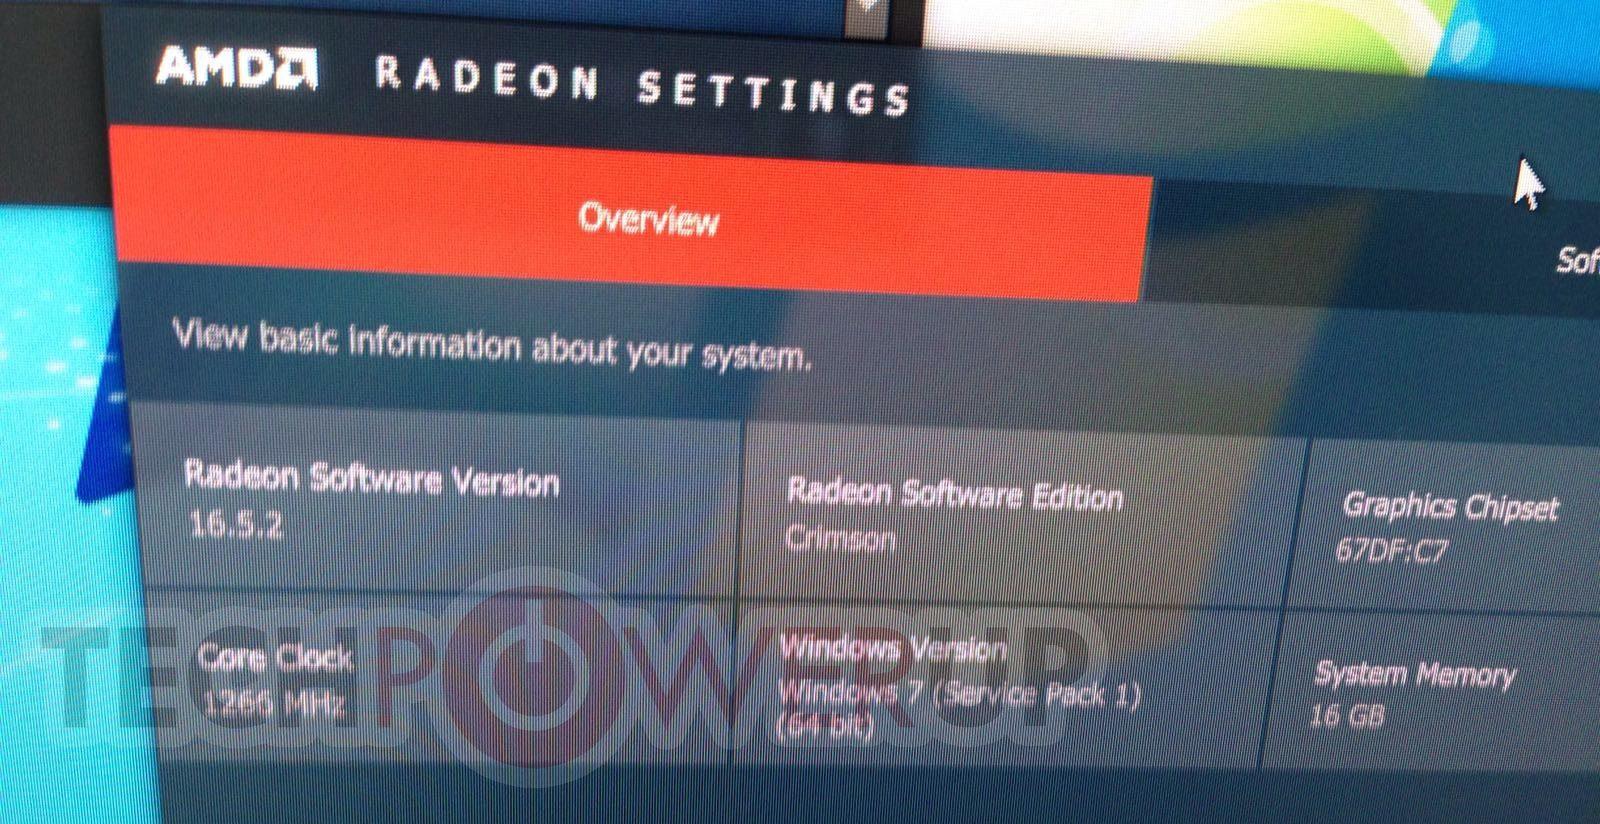 AMD Radeon RX 480 confirmed as Polaris 67DF:C7 | VideoCardz com